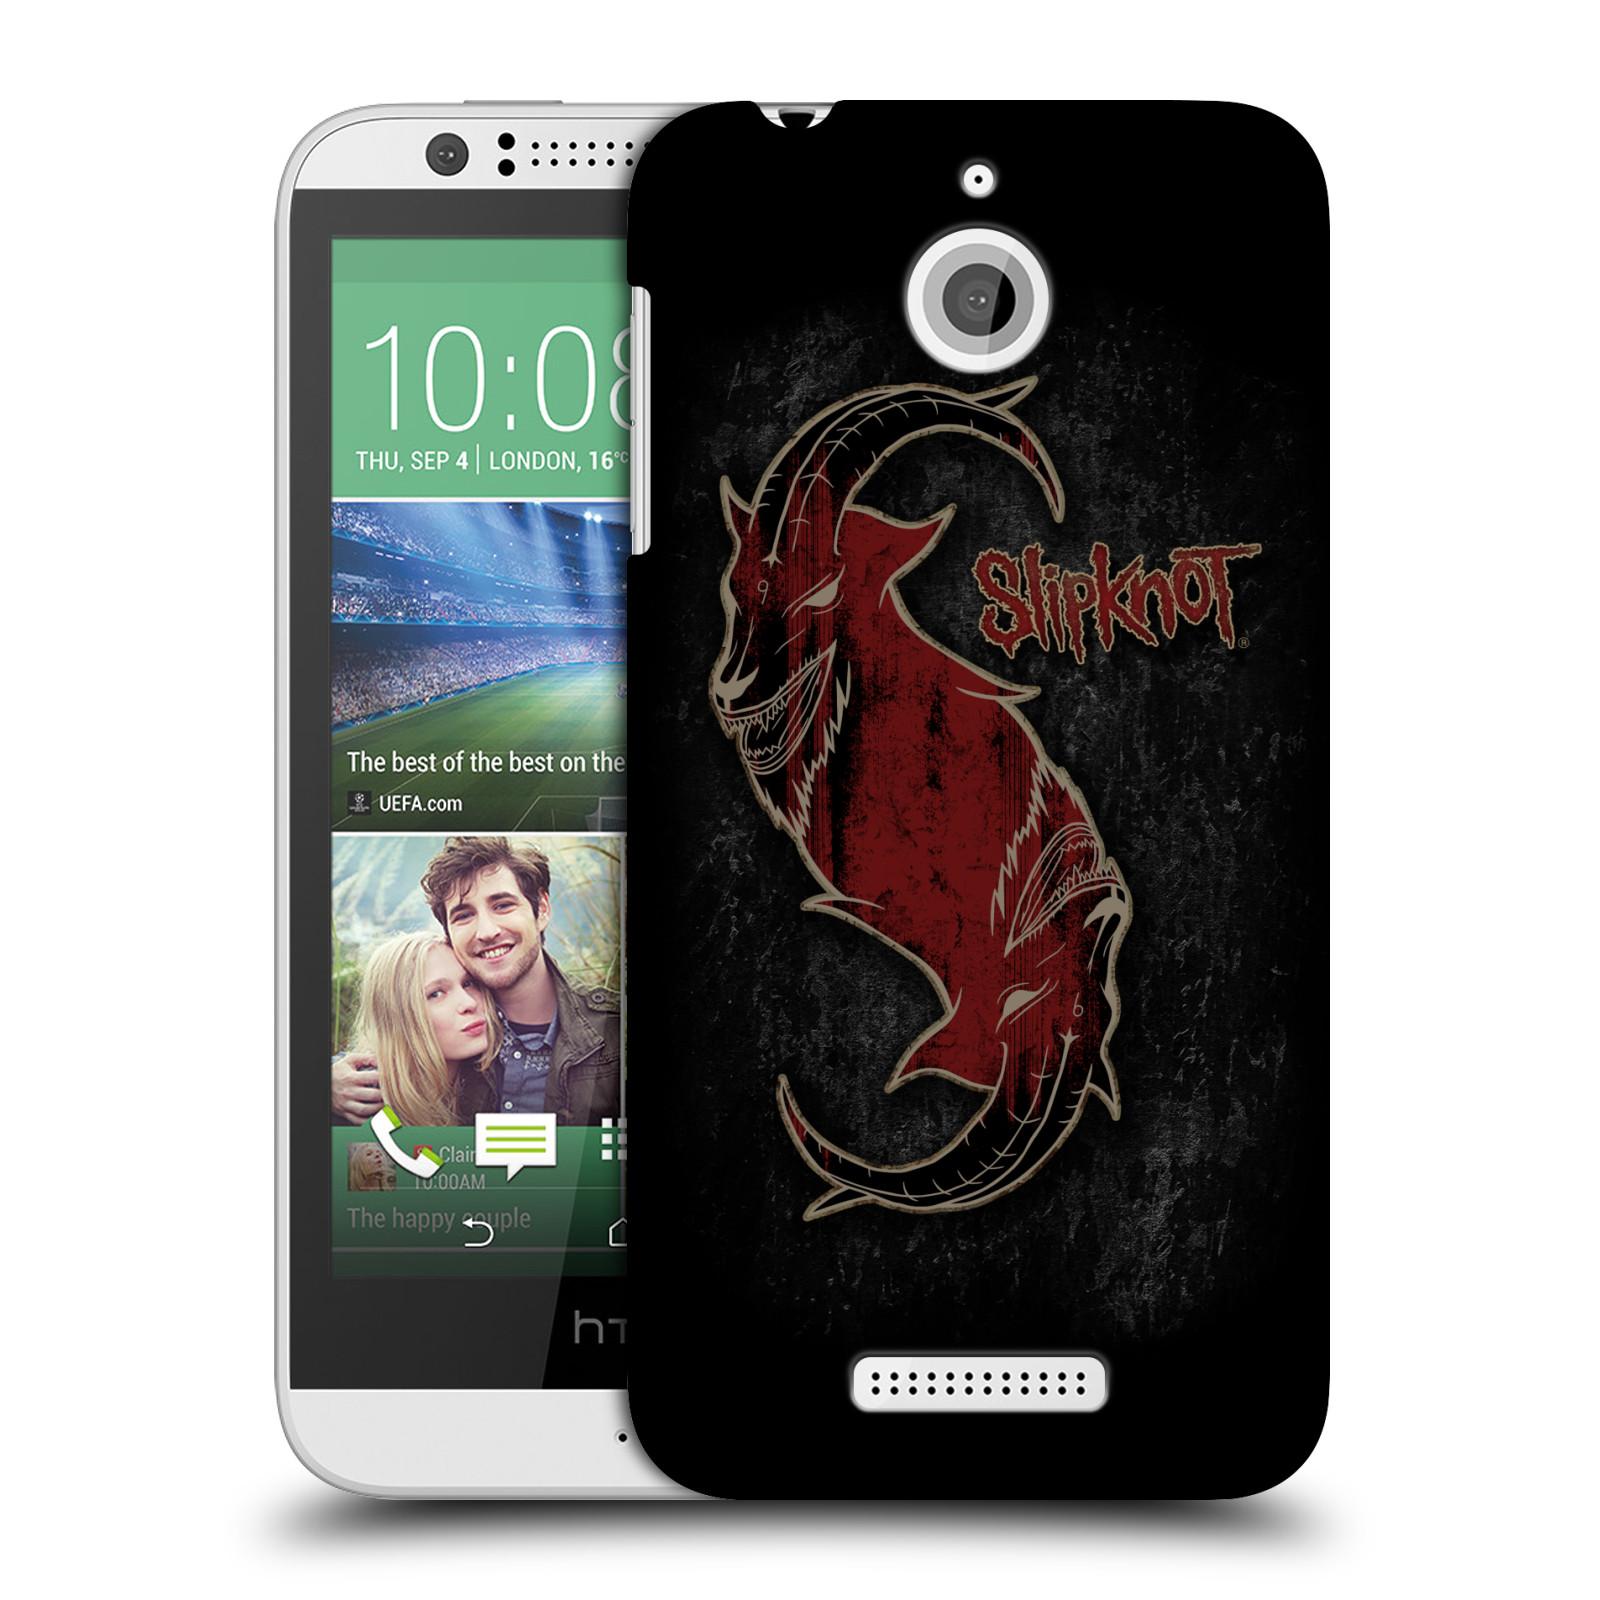 Plastové pouzdro na mobil HTC Desire 510 HEAD CASE Slipknot - Rudý kozel